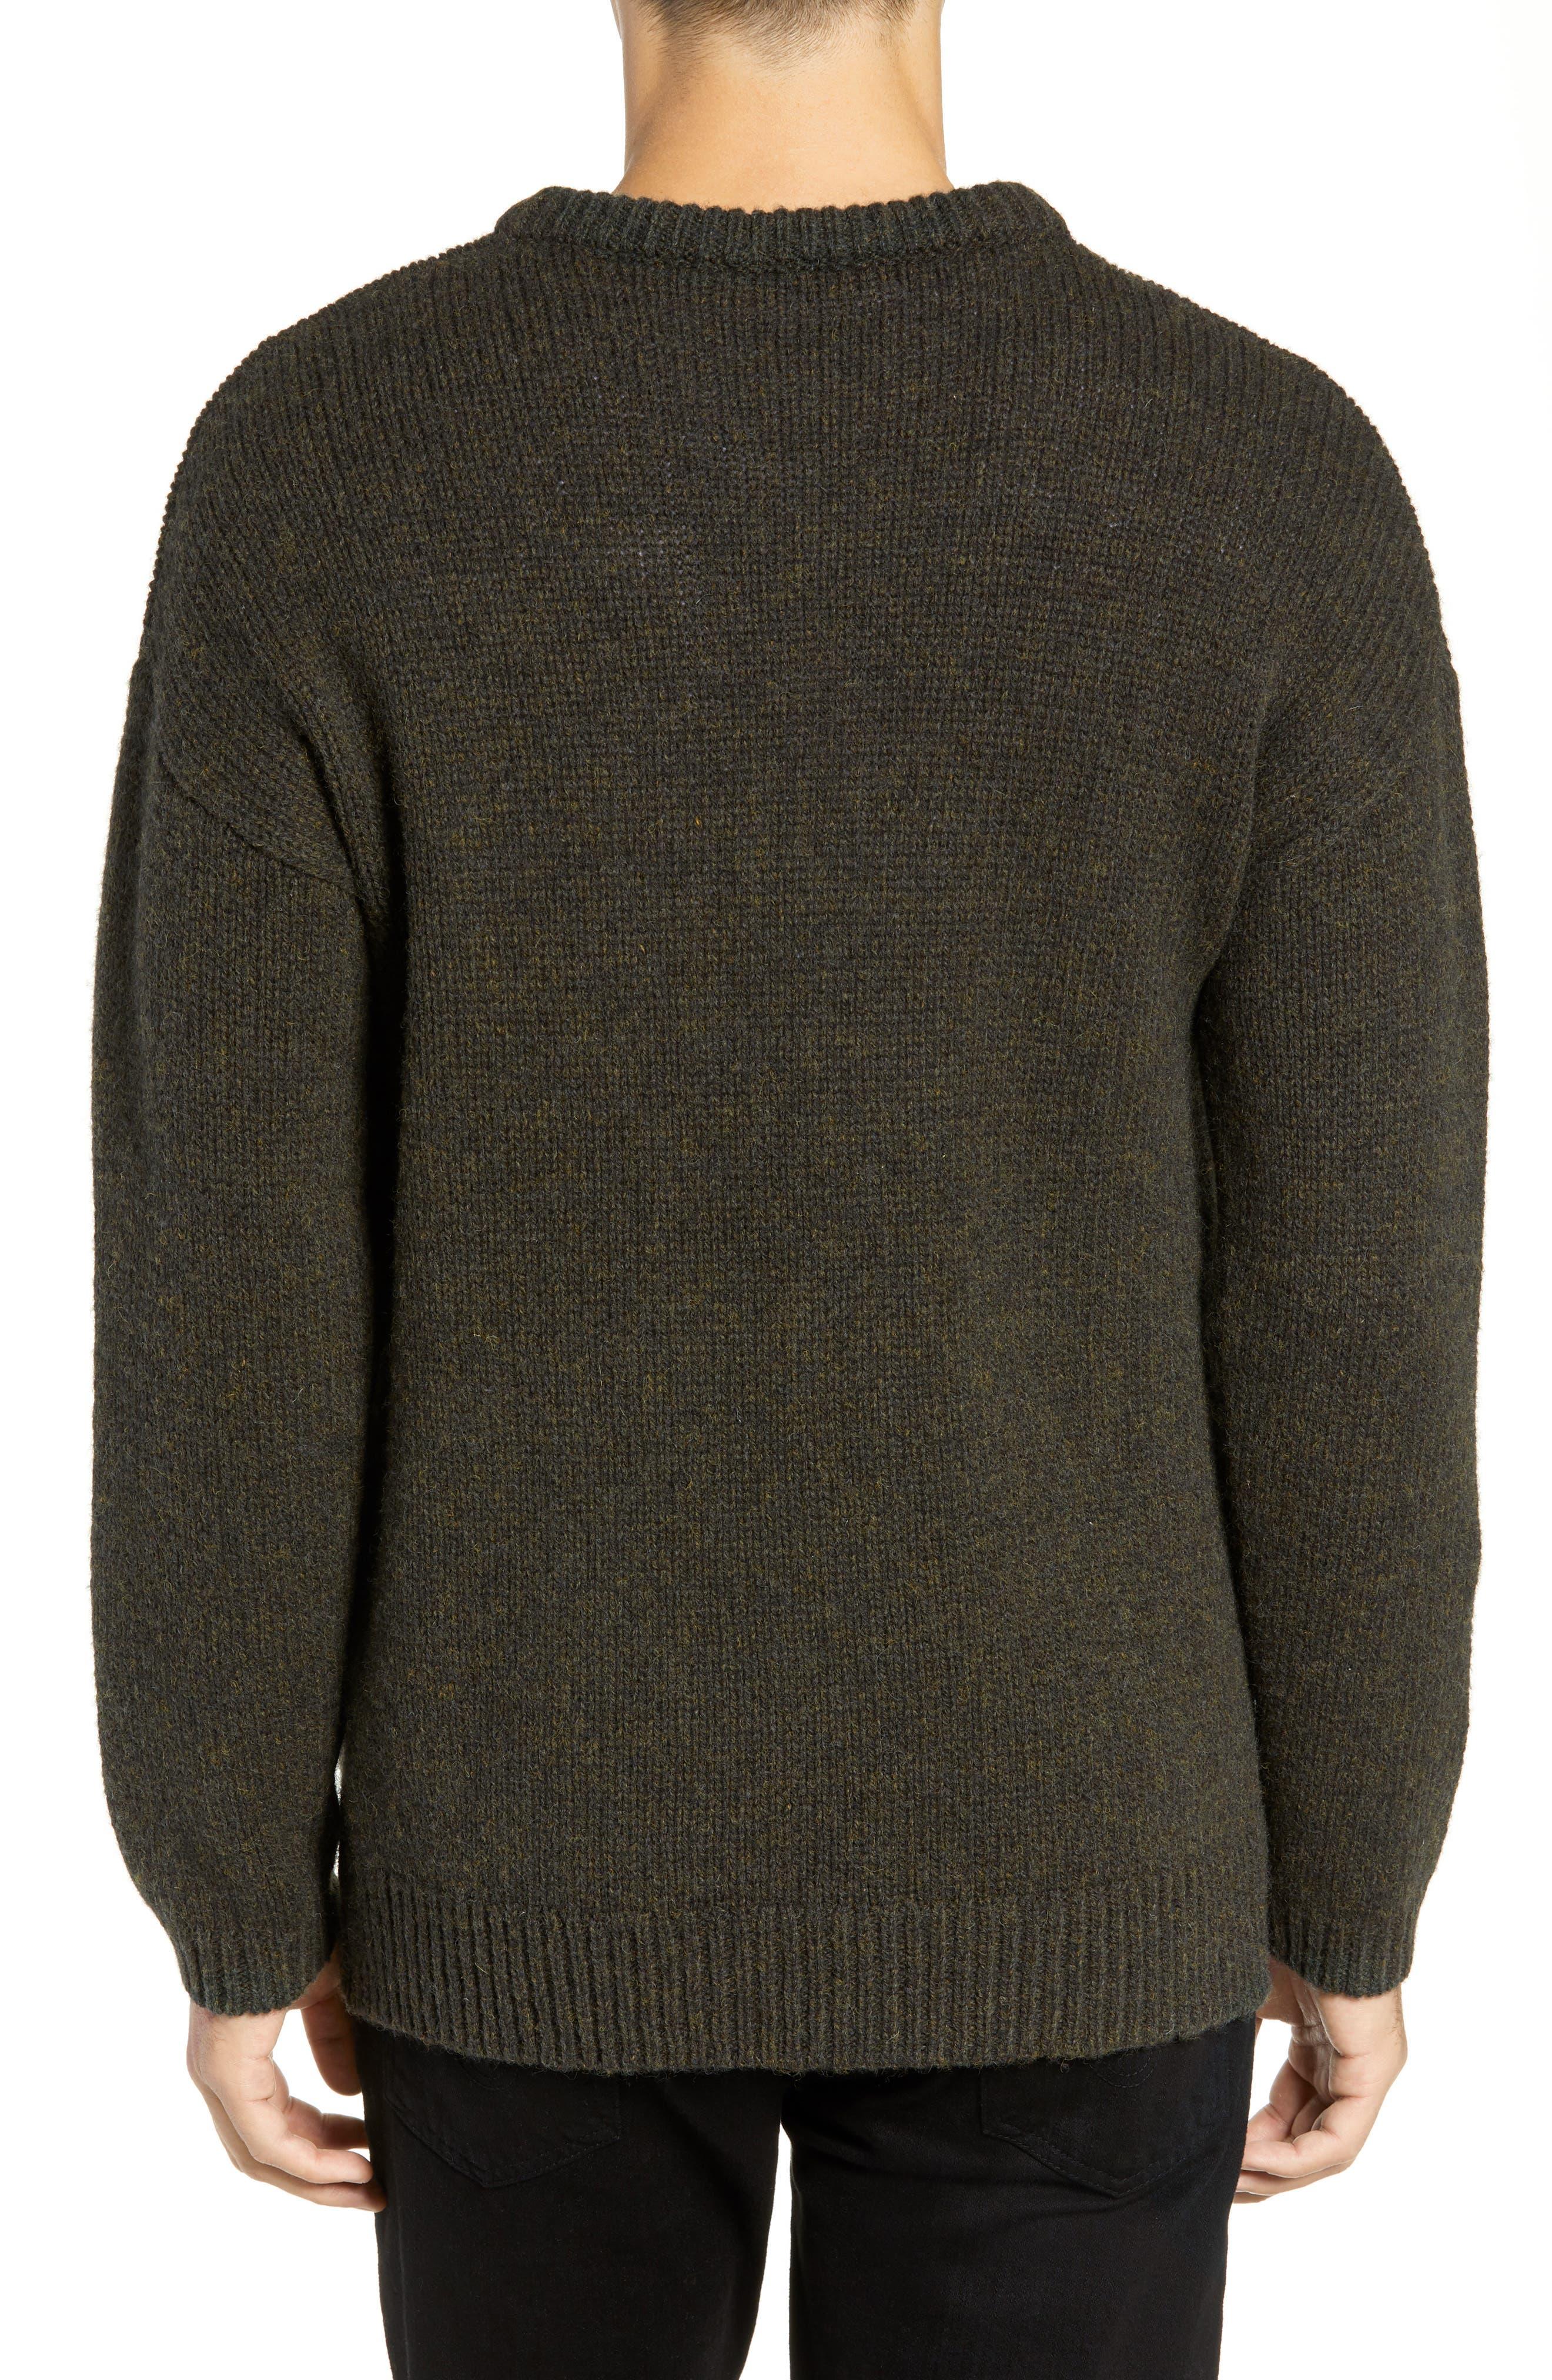 Free Regular Fit Shetland Wool Sweater,                             Alternate thumbnail 2, color,                             MIDNIGHT MOSS BLACK